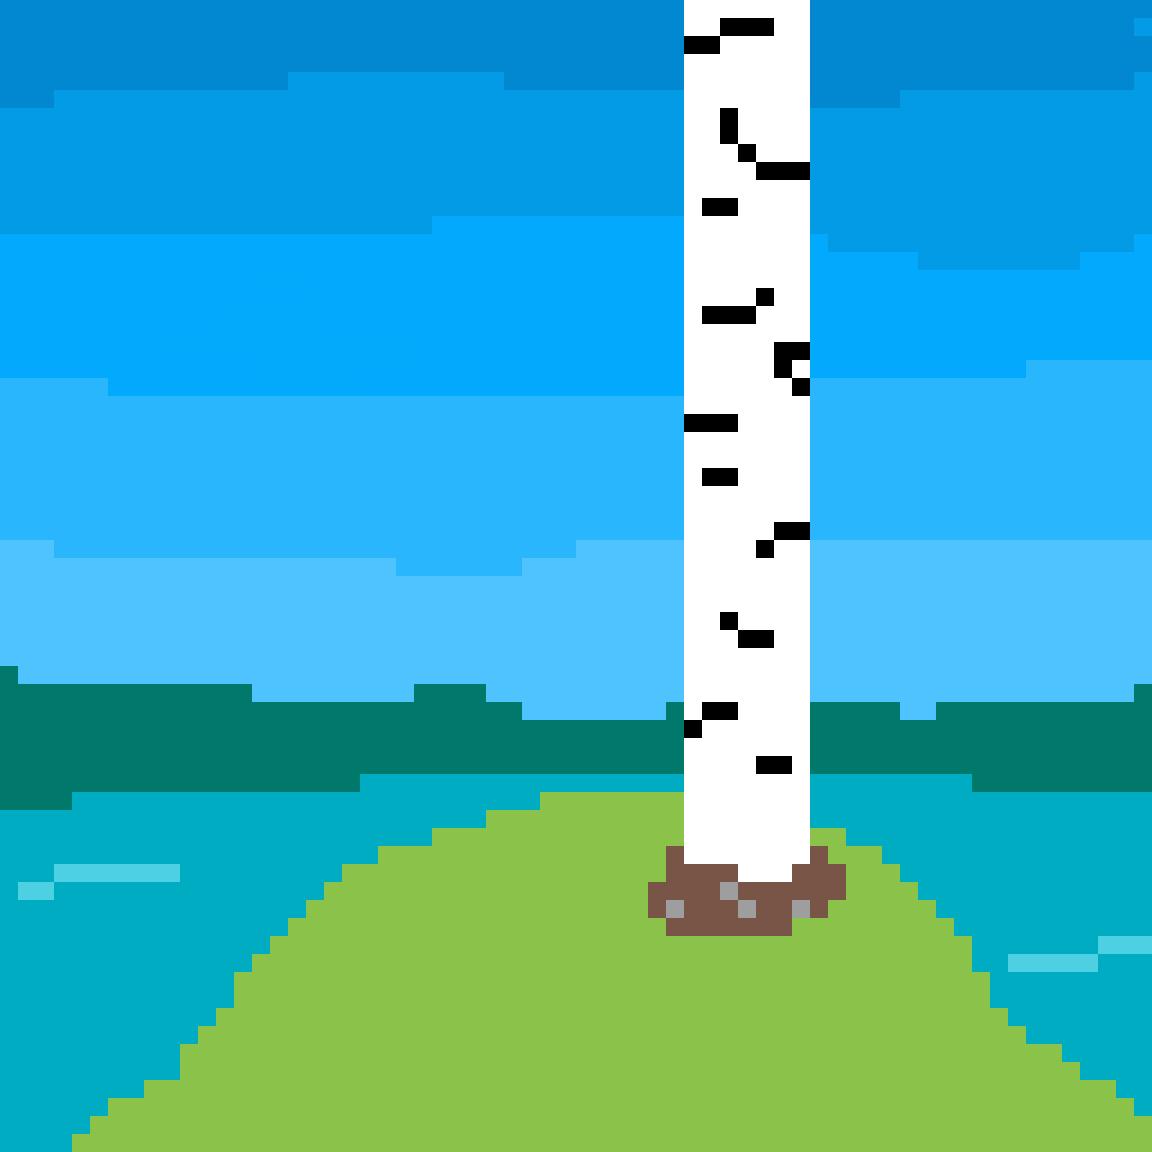 Birch tree by N-K524